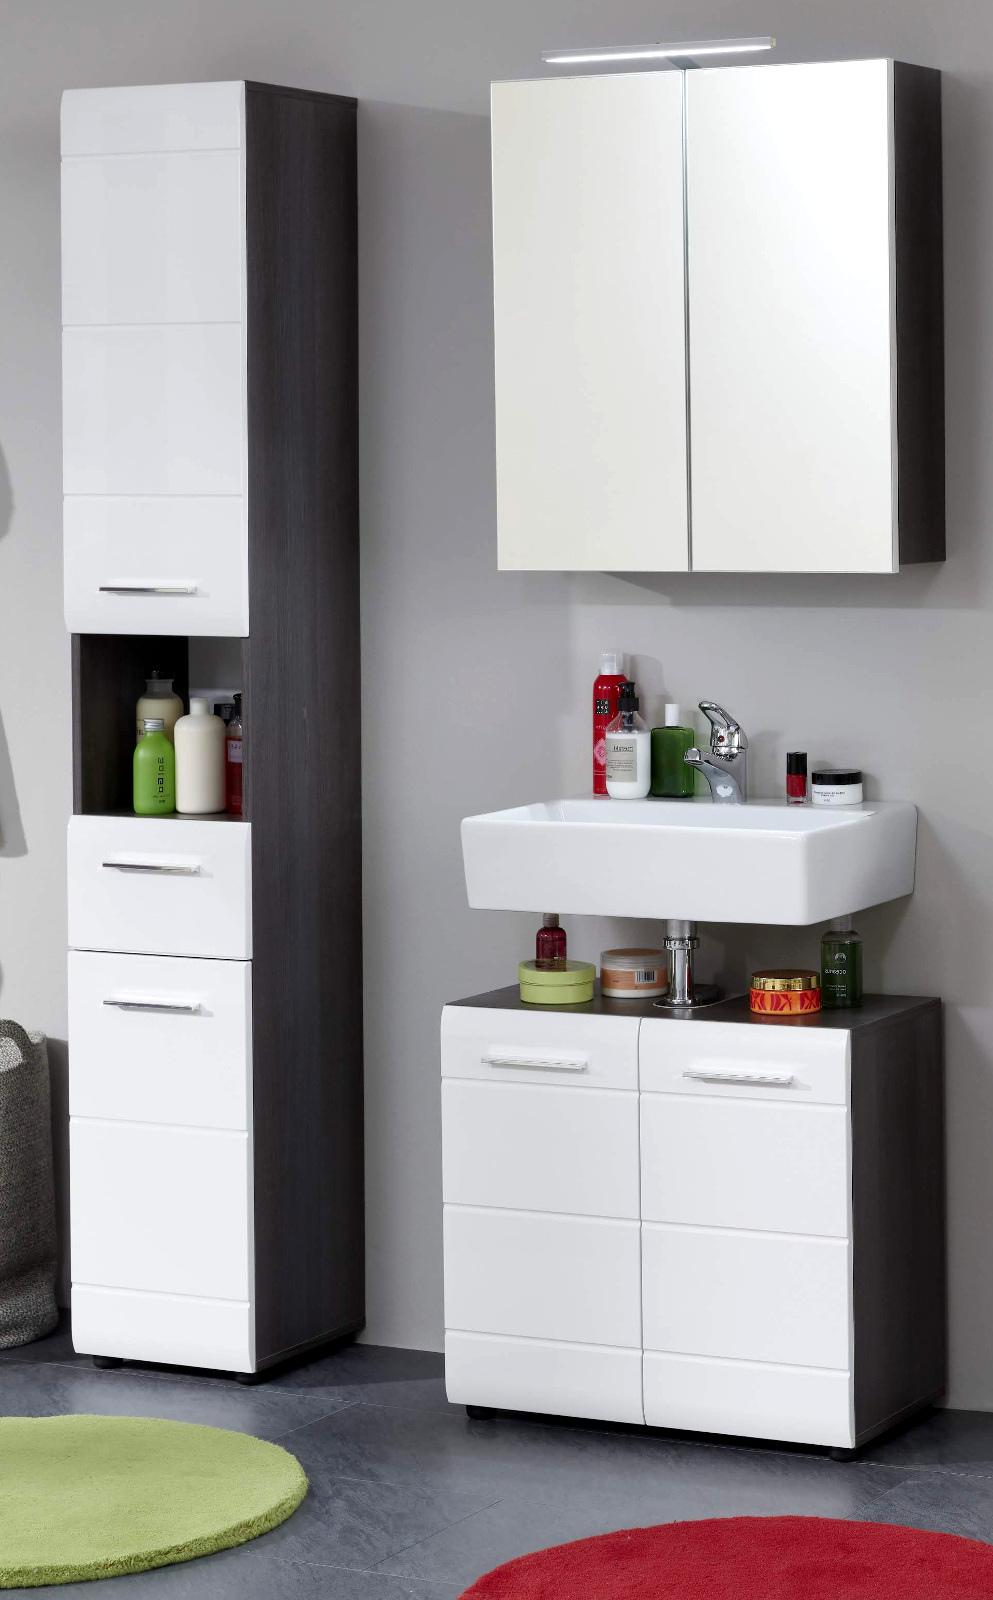 garderobe eiche massiv s gerau naturas ebay. Black Bedroom Furniture Sets. Home Design Ideas